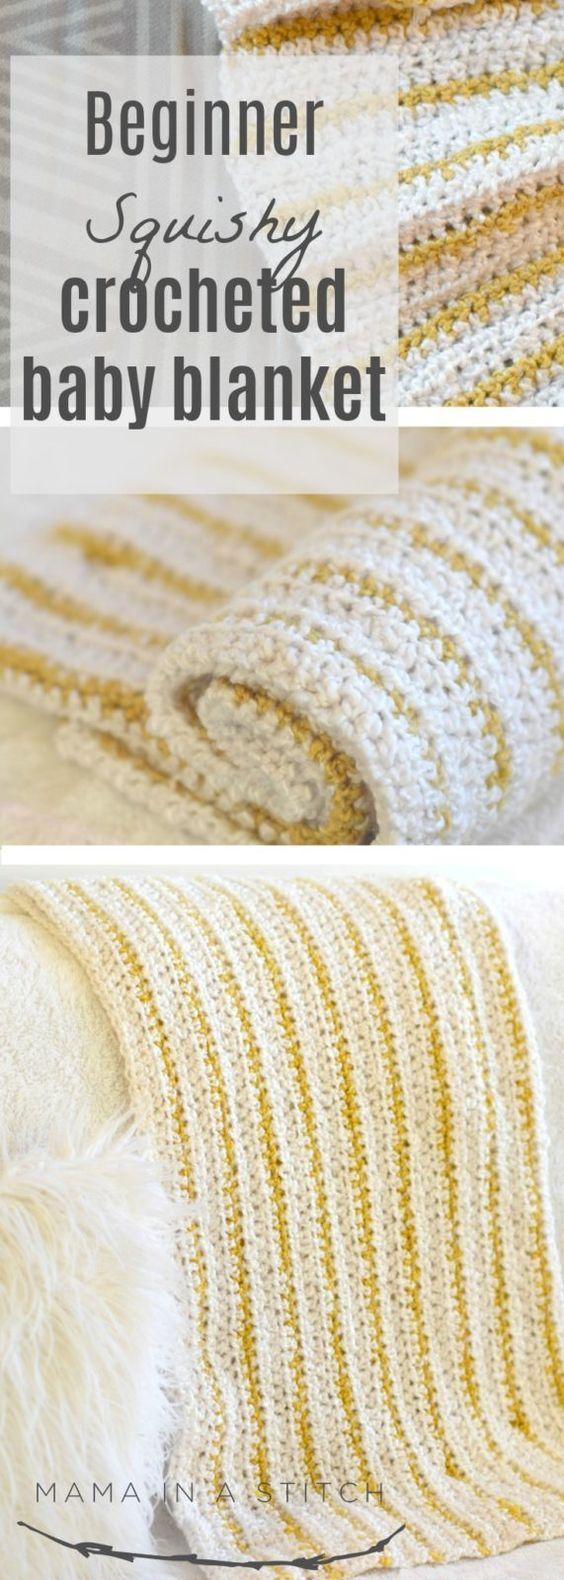 The Stitching Mommy: Soft Beginner Crochet Blanket Pattern